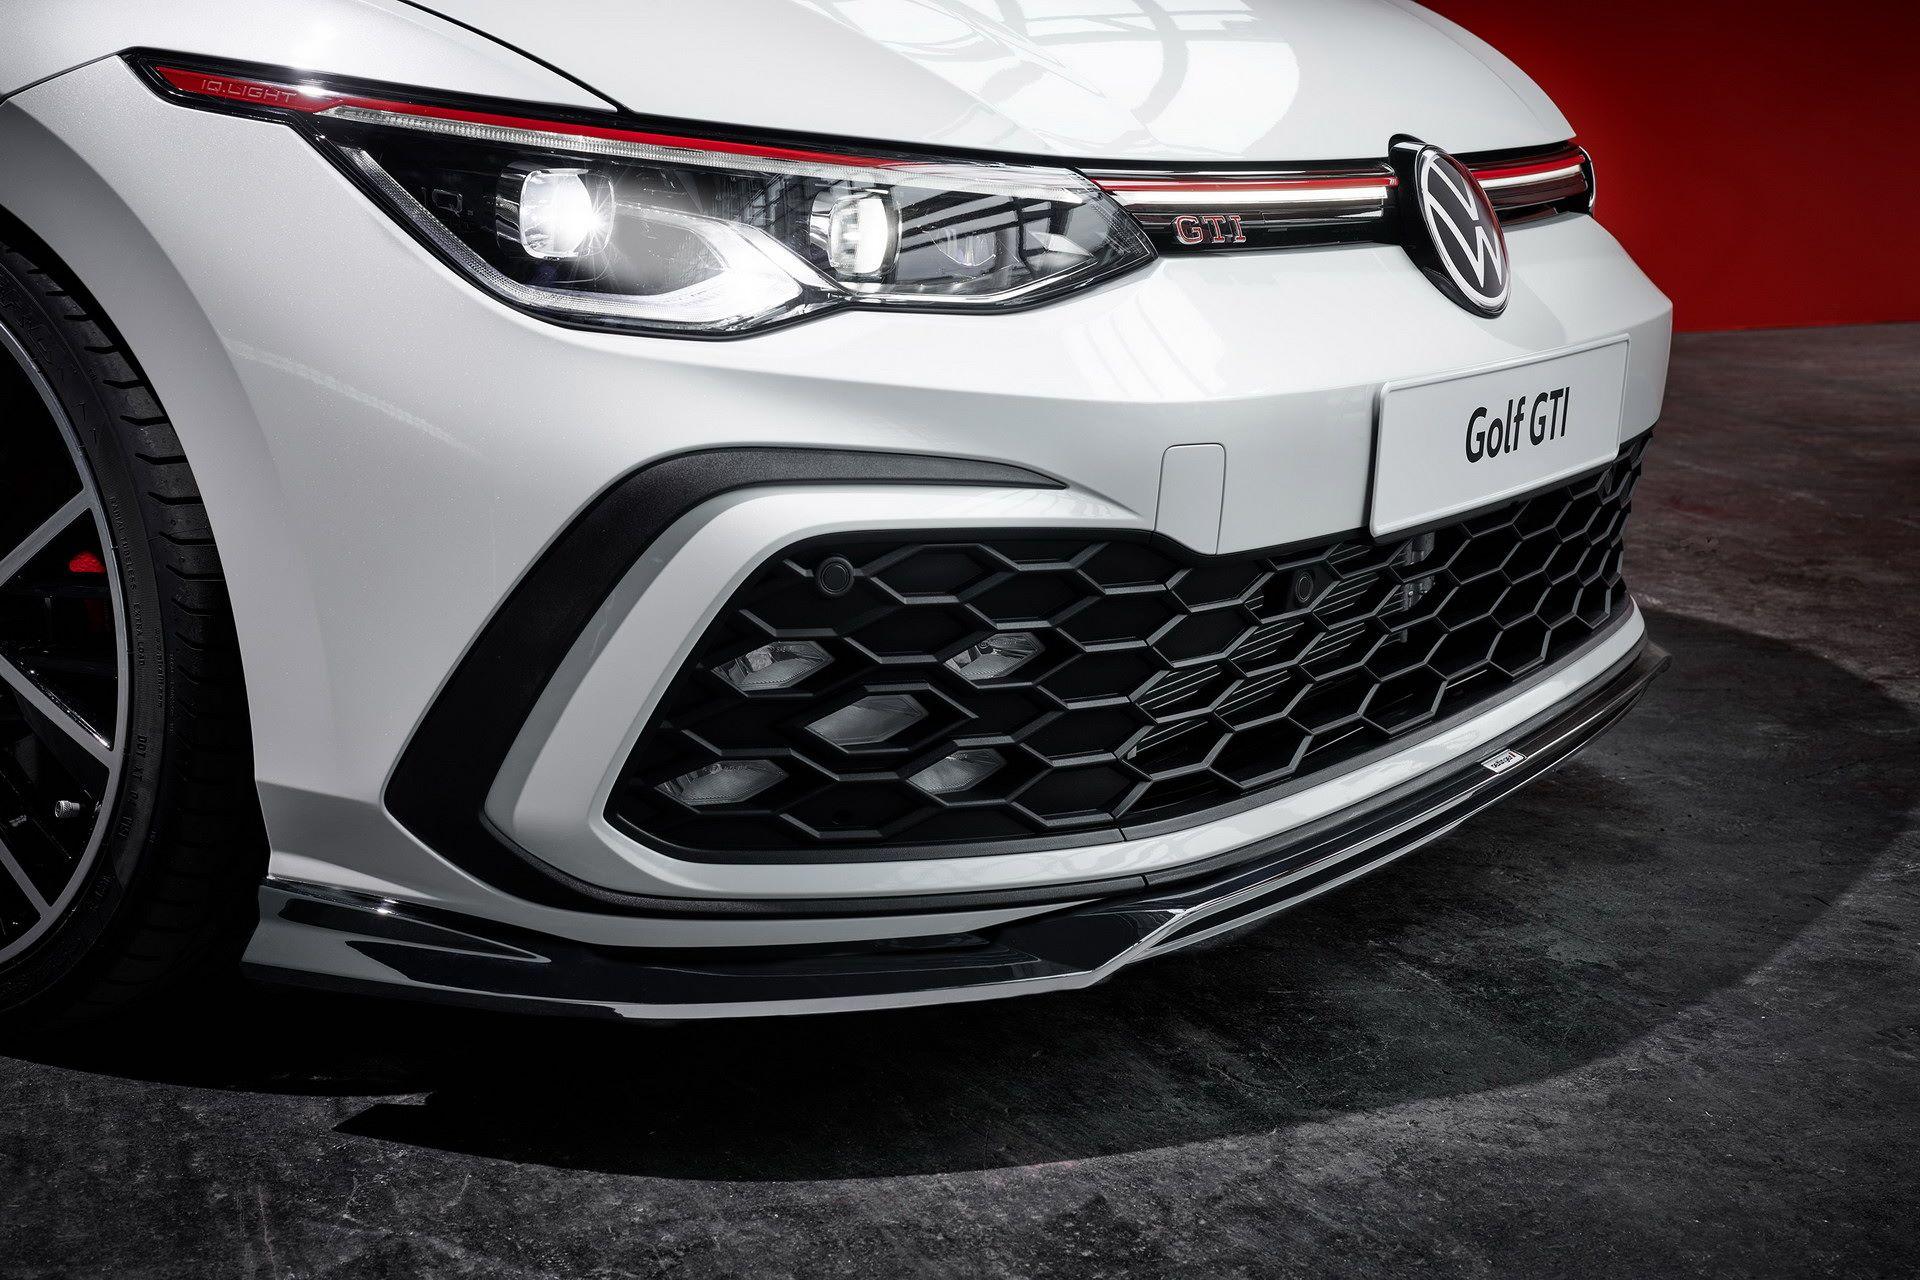 VW-Golf-GTI-By-Oettinger-6